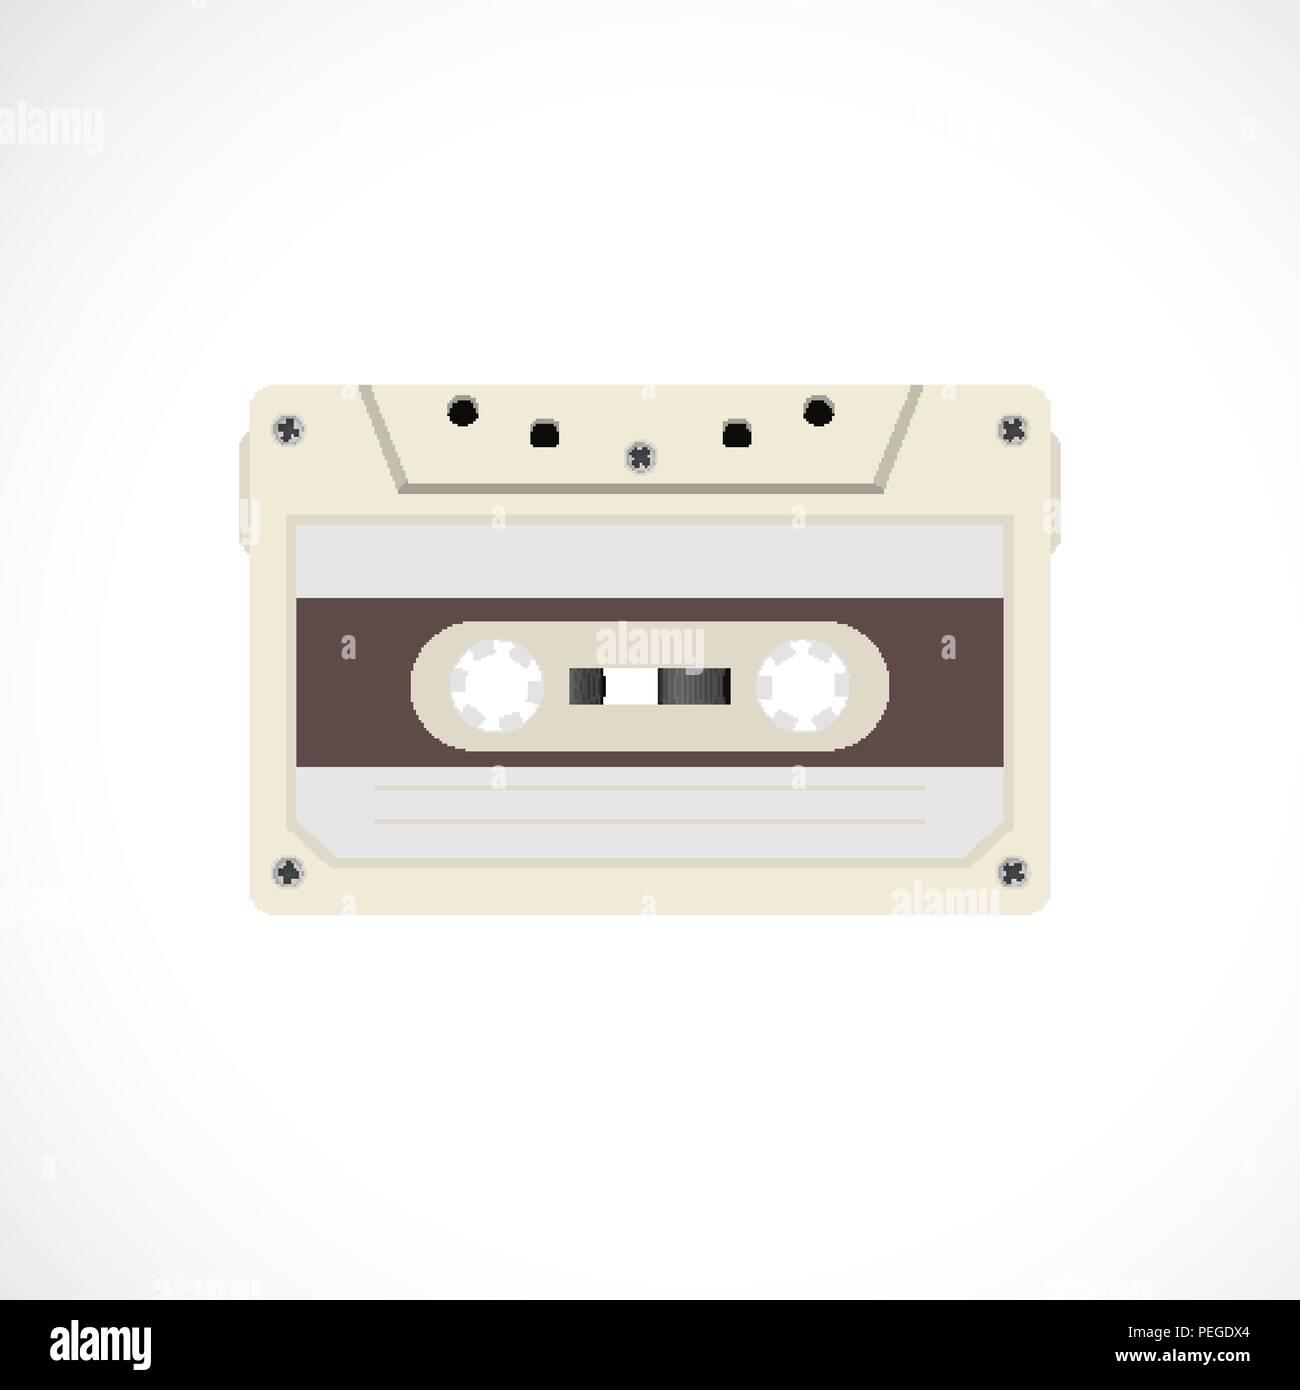 Retro style magnetic audiotape. 1980s vintage album music storage device. Old audio tape cassette - Stock Image